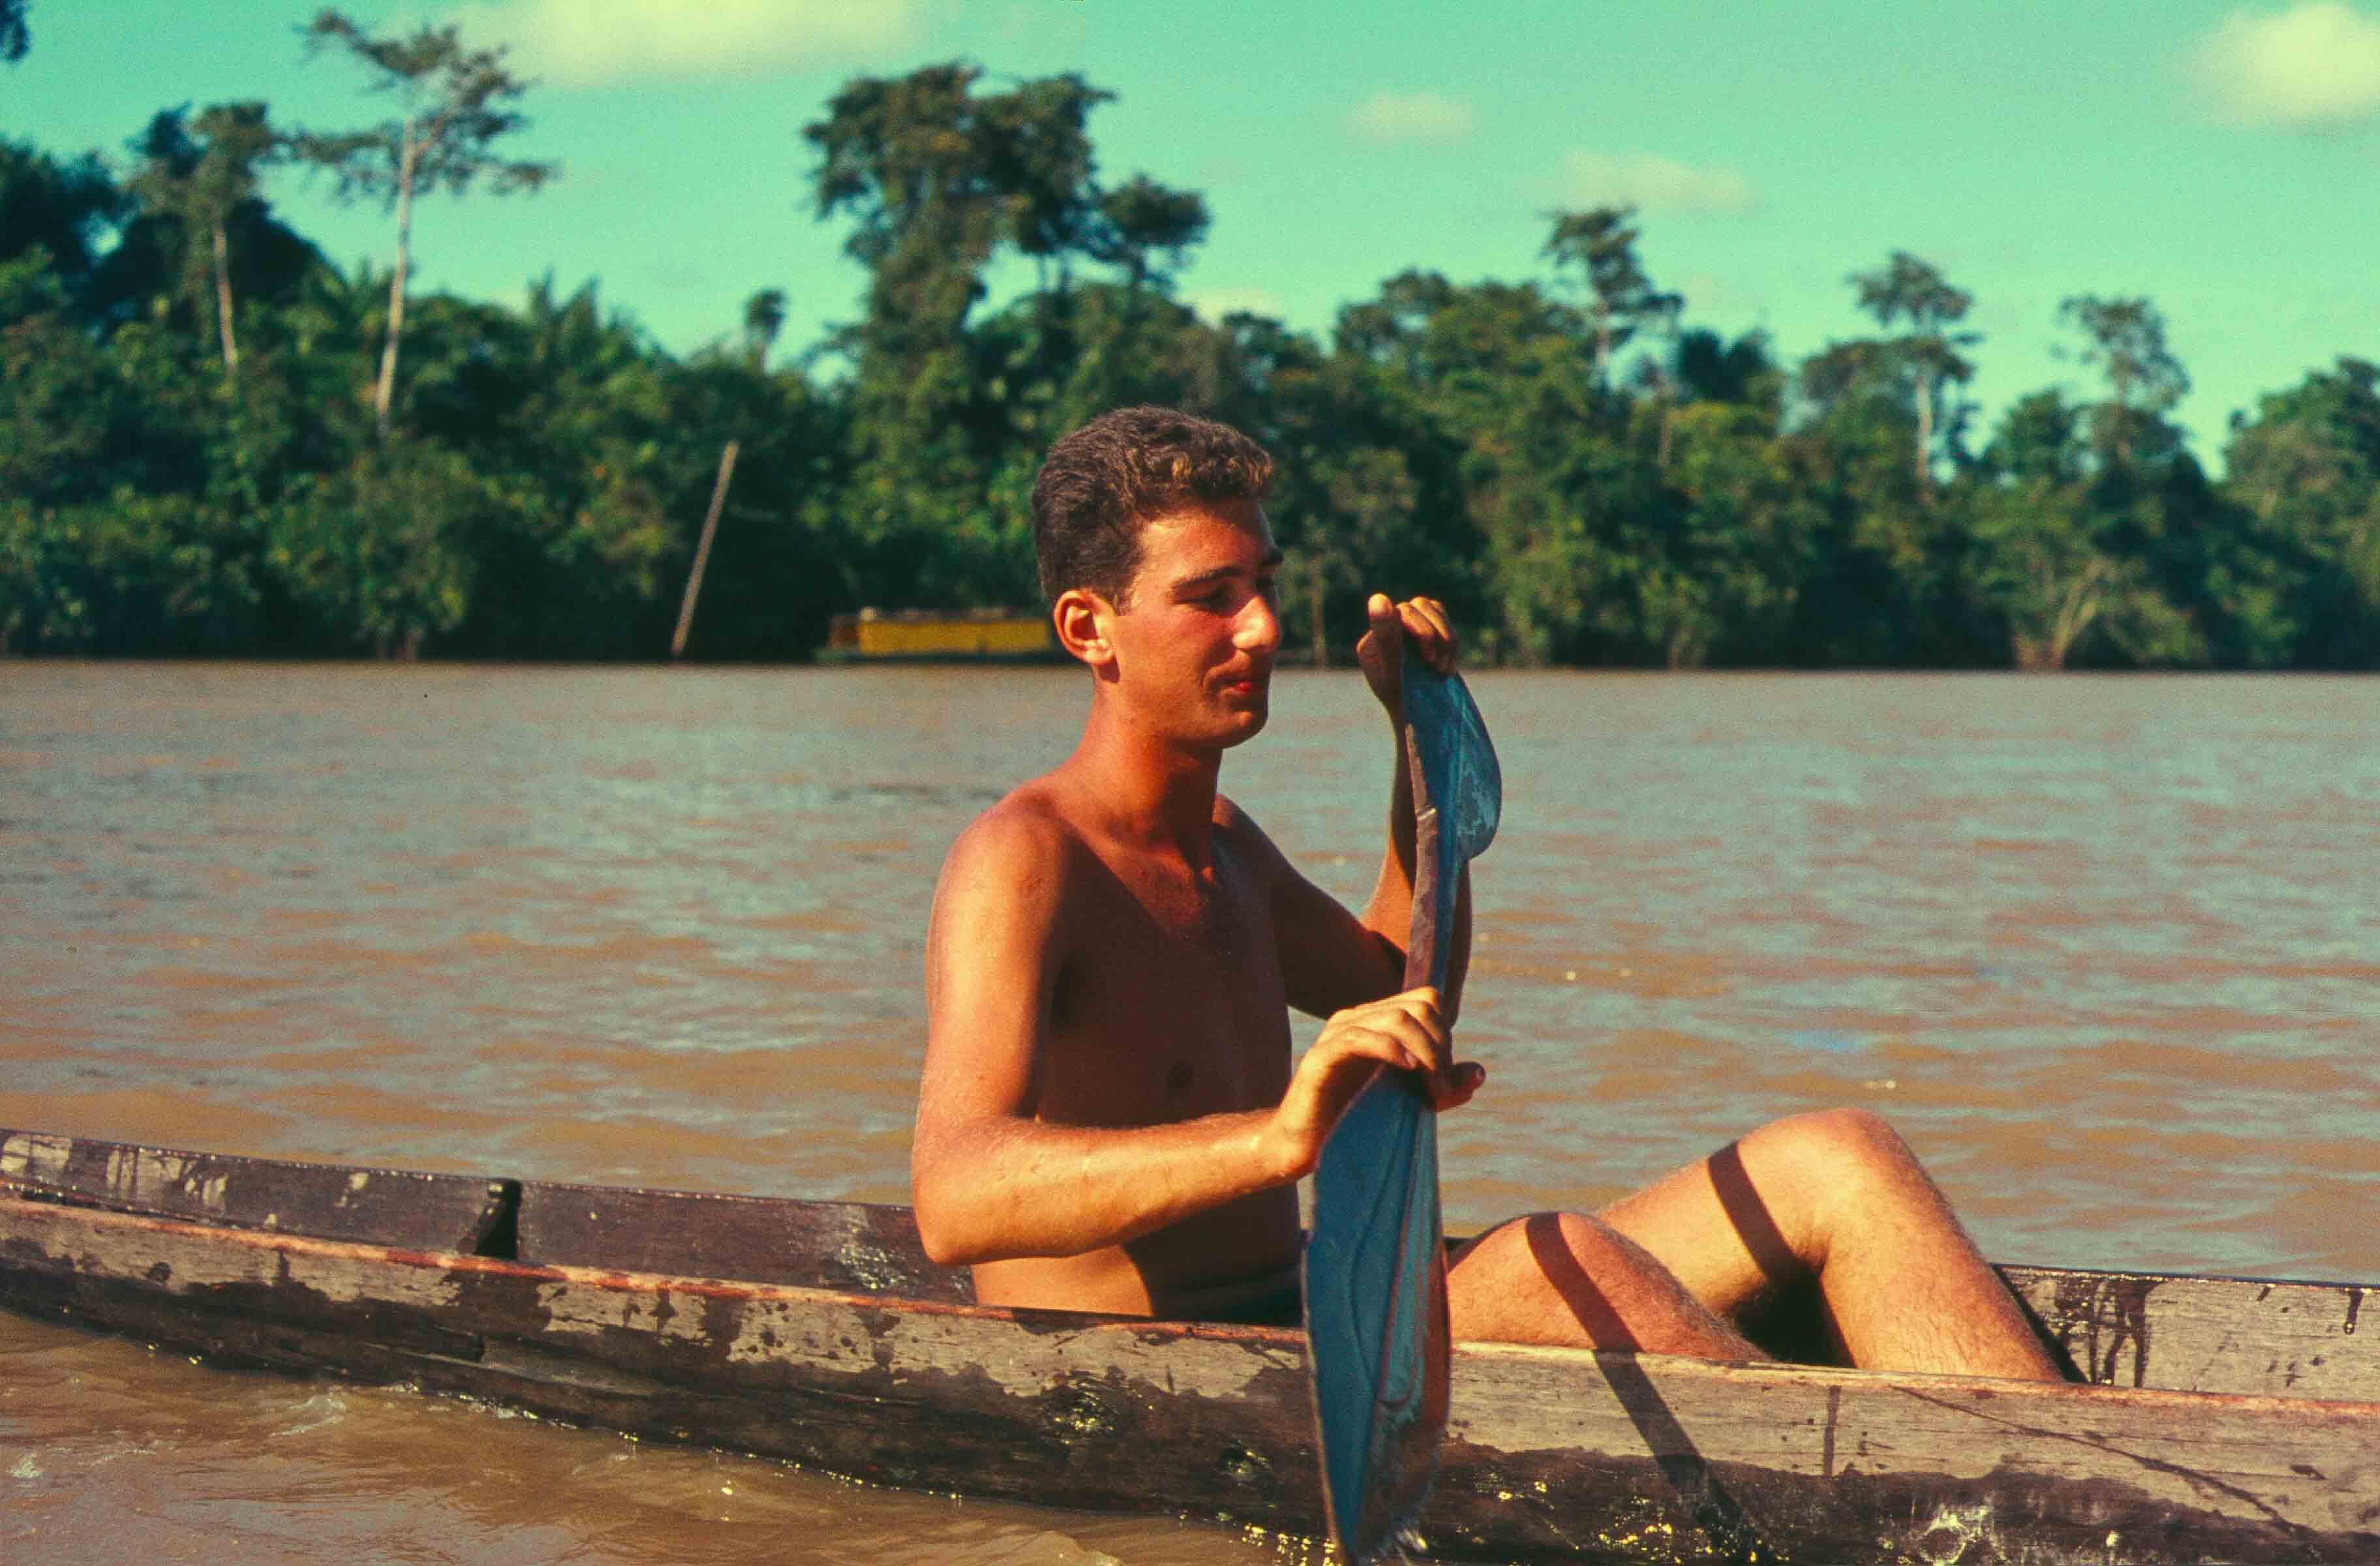 551. Suriname